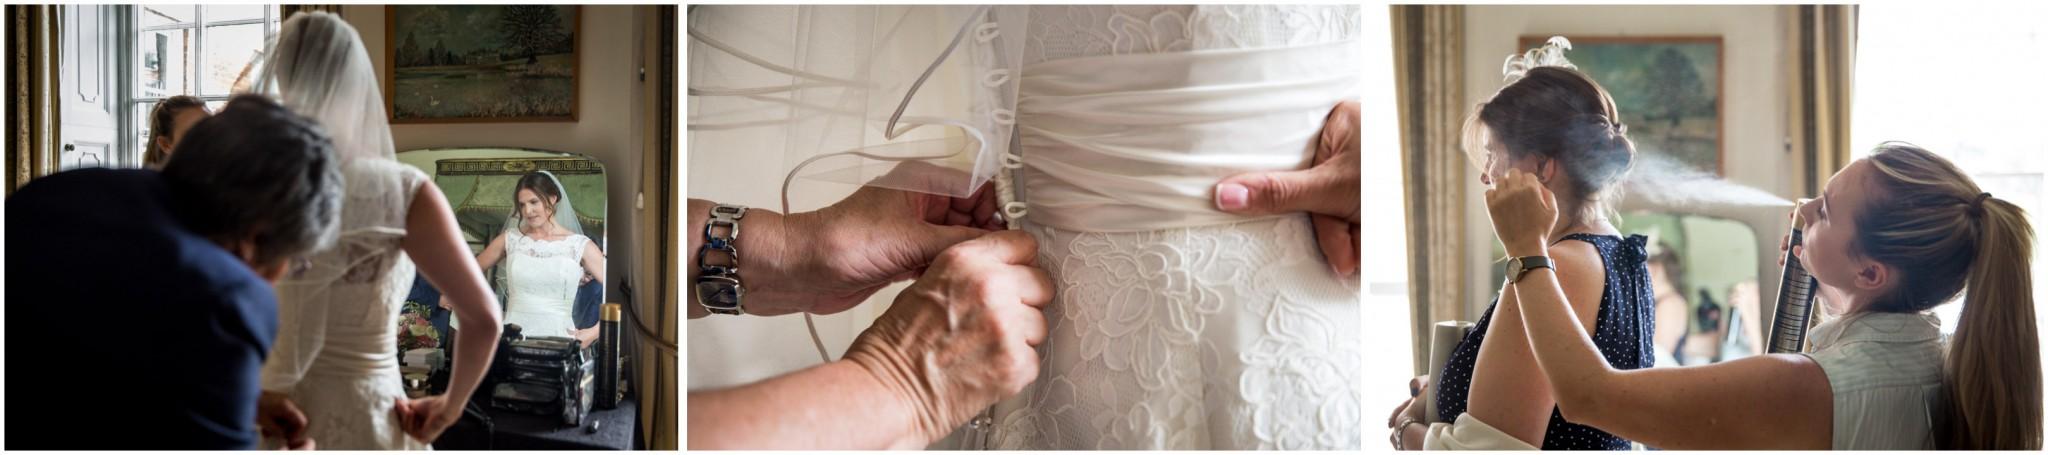 Avington Park Wedding Bride in Wedding Dress